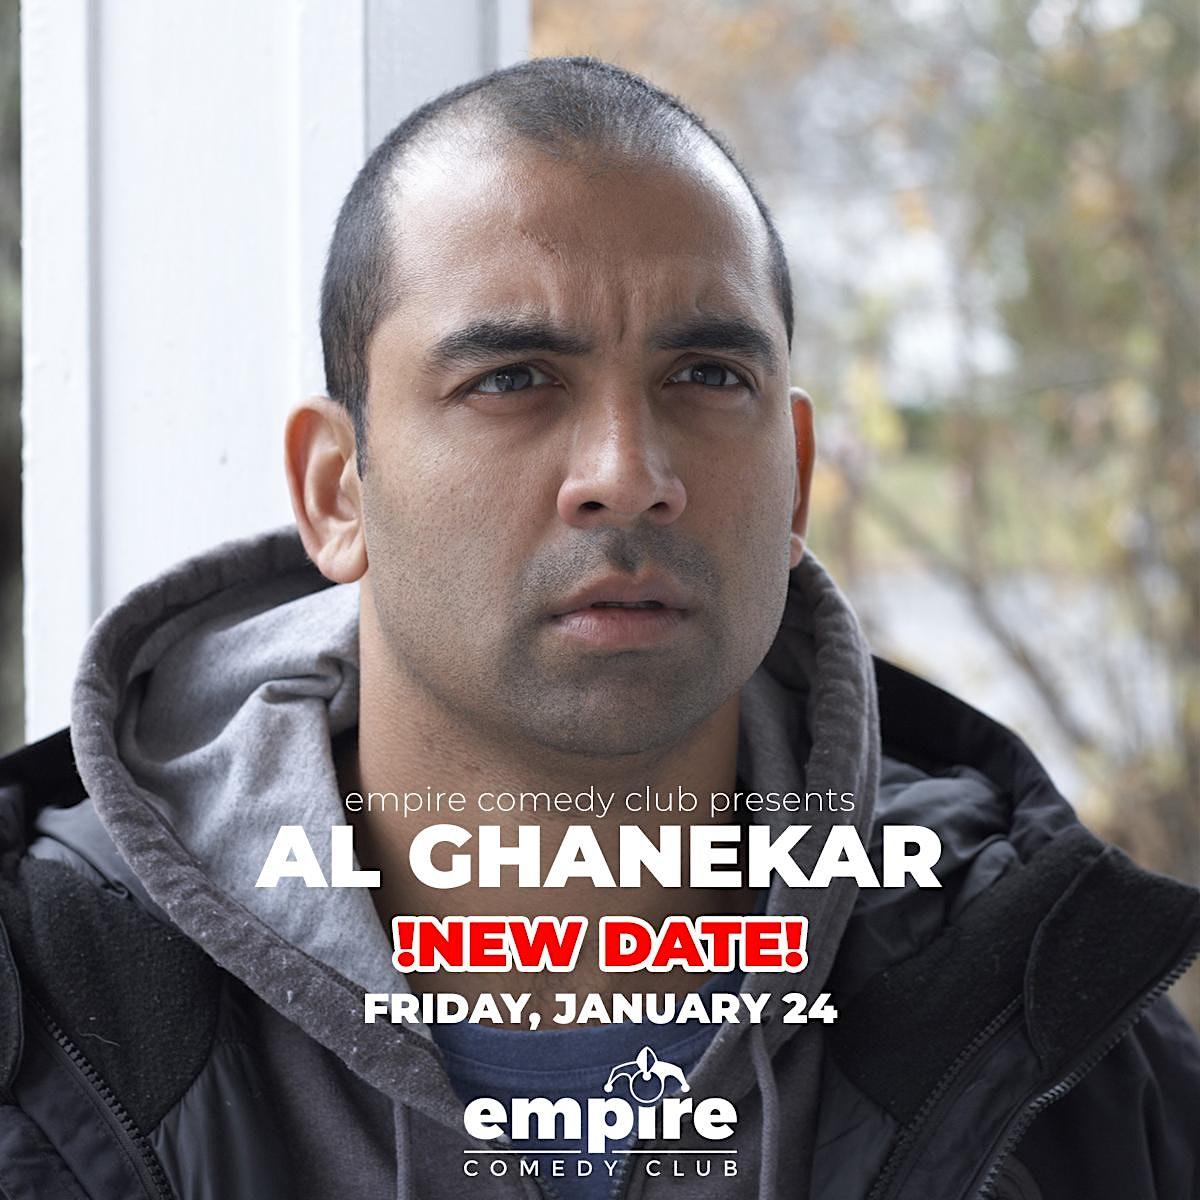 Al Ghanekar (DATE CHANGE TO FRI. 1/24)